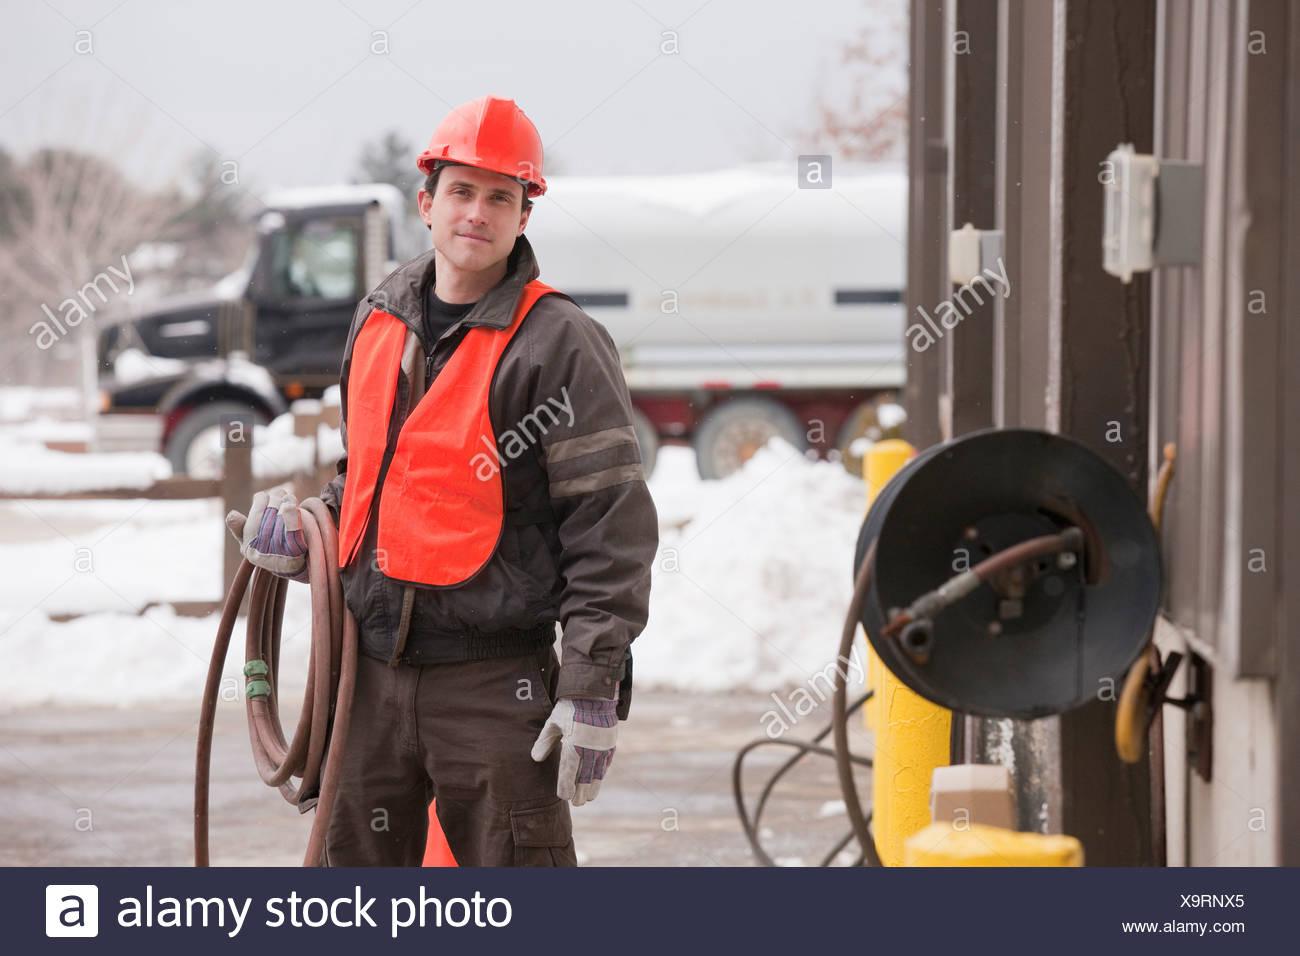 Transportation engineer unrolling hose at an industrial garage - Stock Image